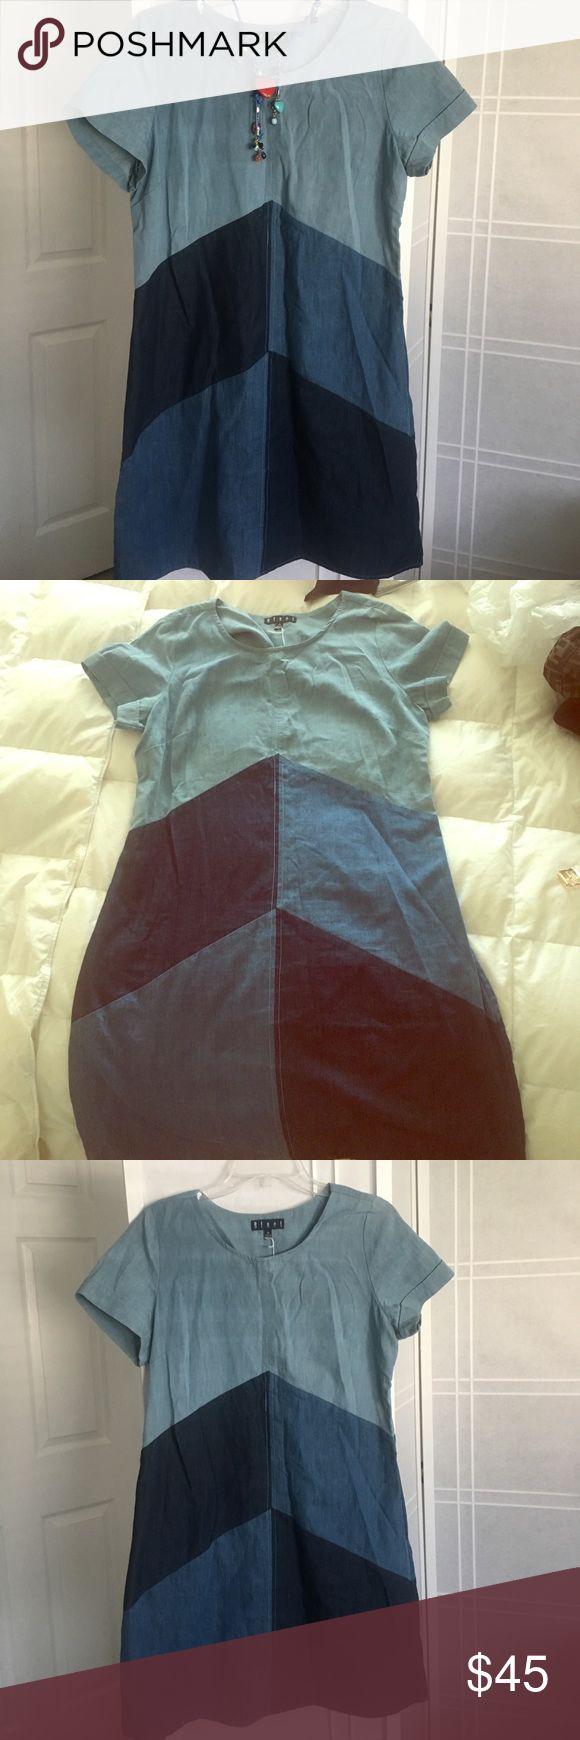 Beautiful Jeans dress bluet Casual all occasions dress jeans whit multi colors jeans Dresses Mini